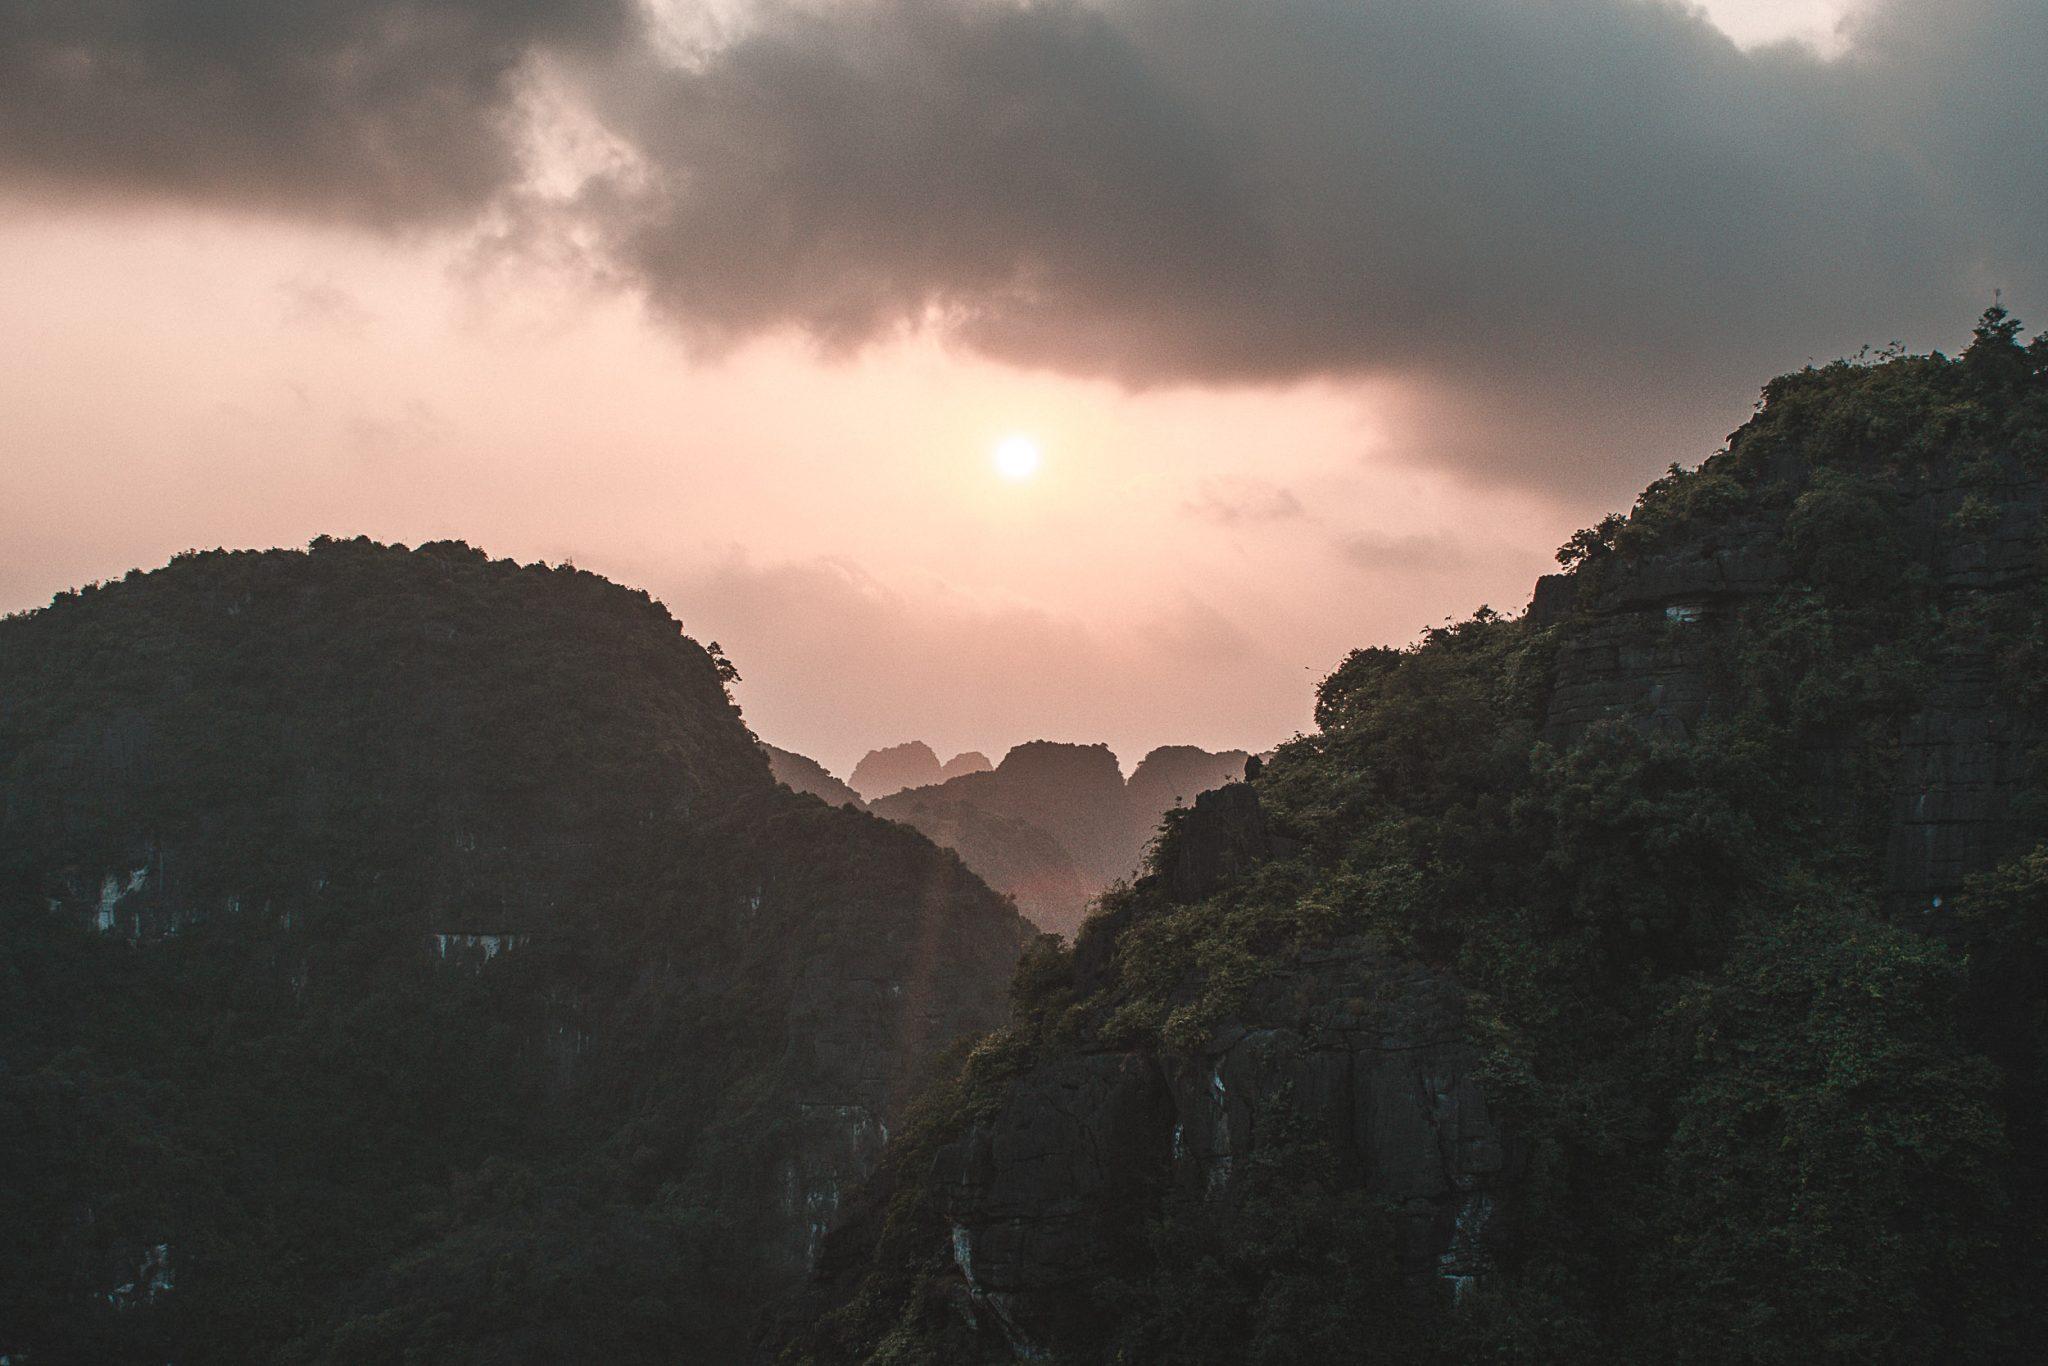 Pôr do sol em Ninh Binh no Vietnã